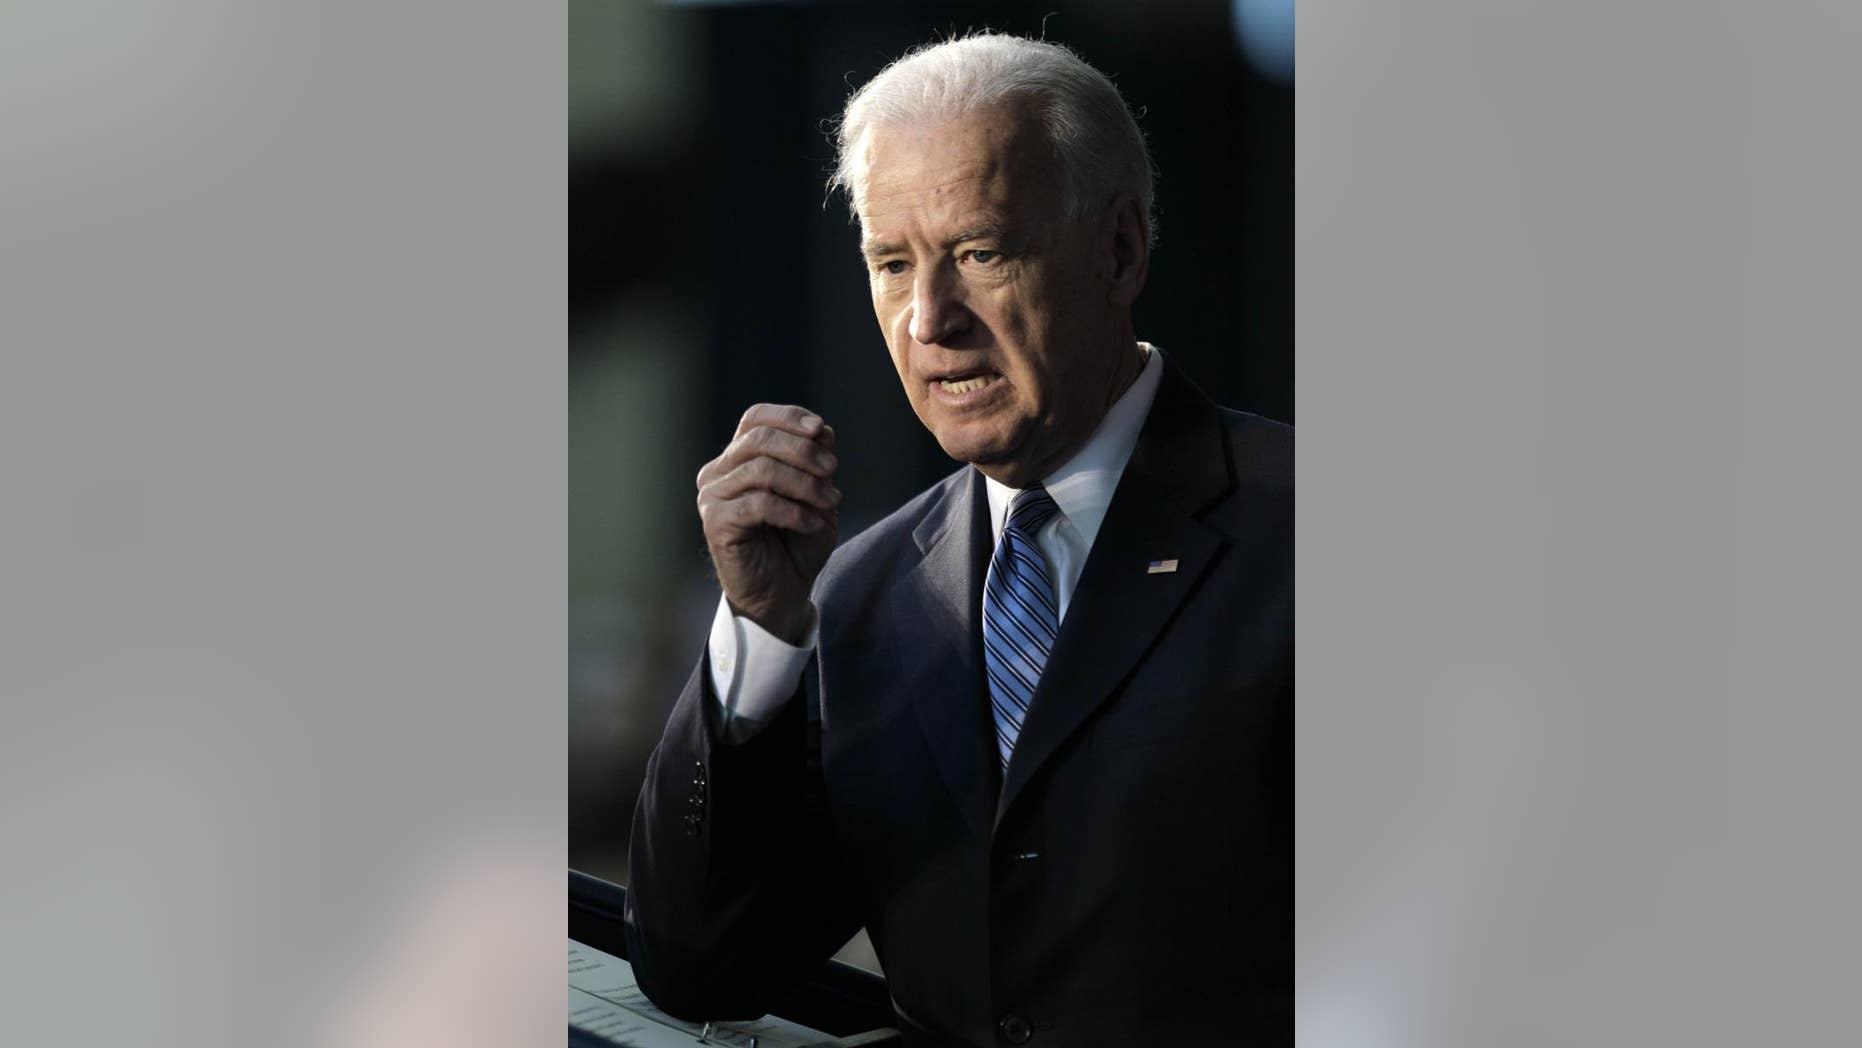 Vice President Joe Biden speaks at the McConnell Center at the University of Louisville in Louisville, Ky., Friday, Feb. 11, 2011. (AP Photo/Ed Reinke)